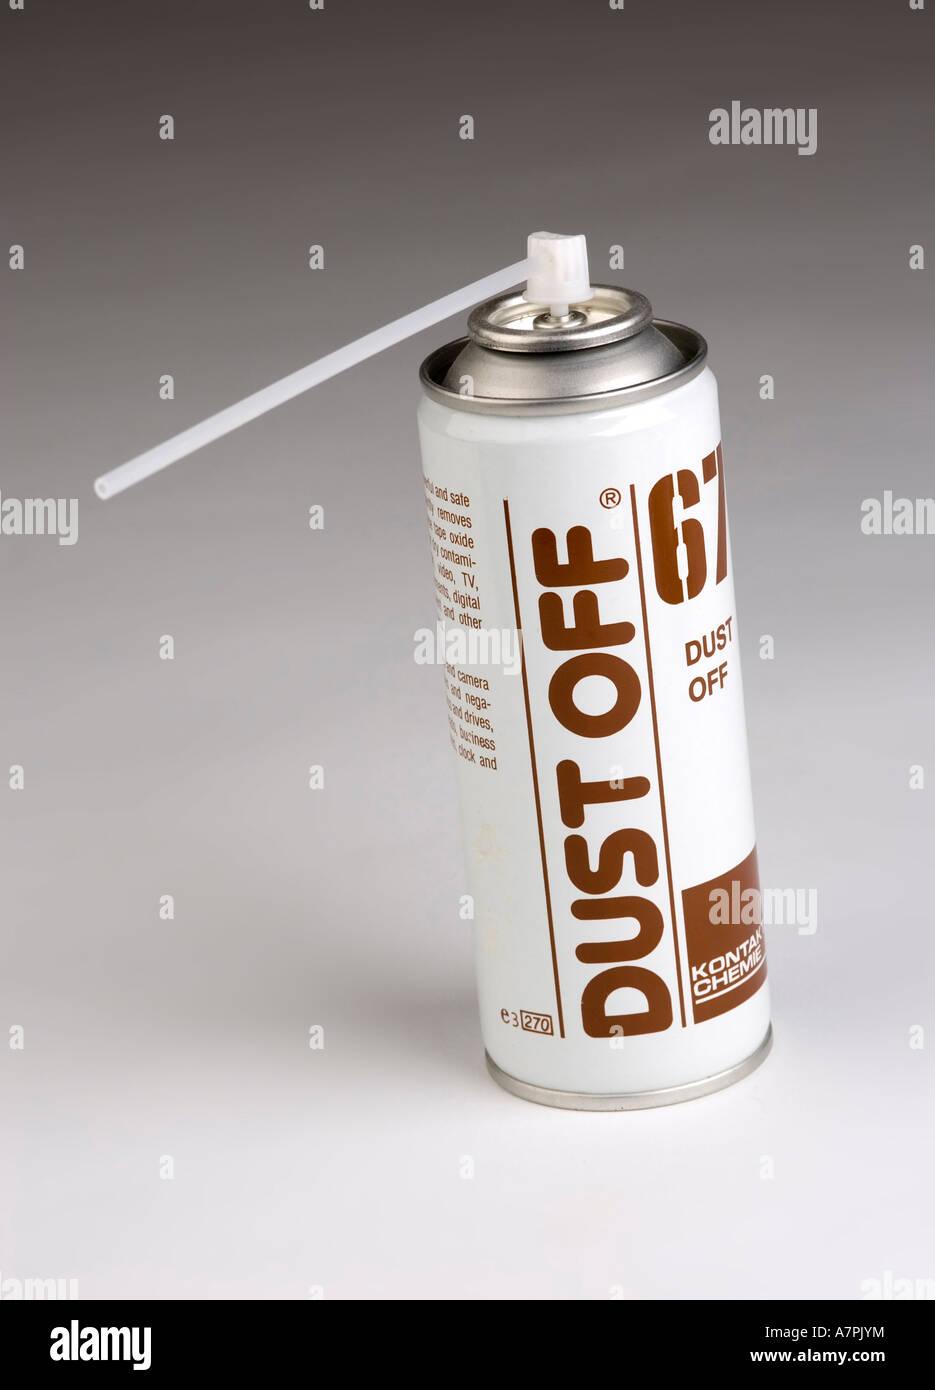 compressed air aerosol can - Stock Image